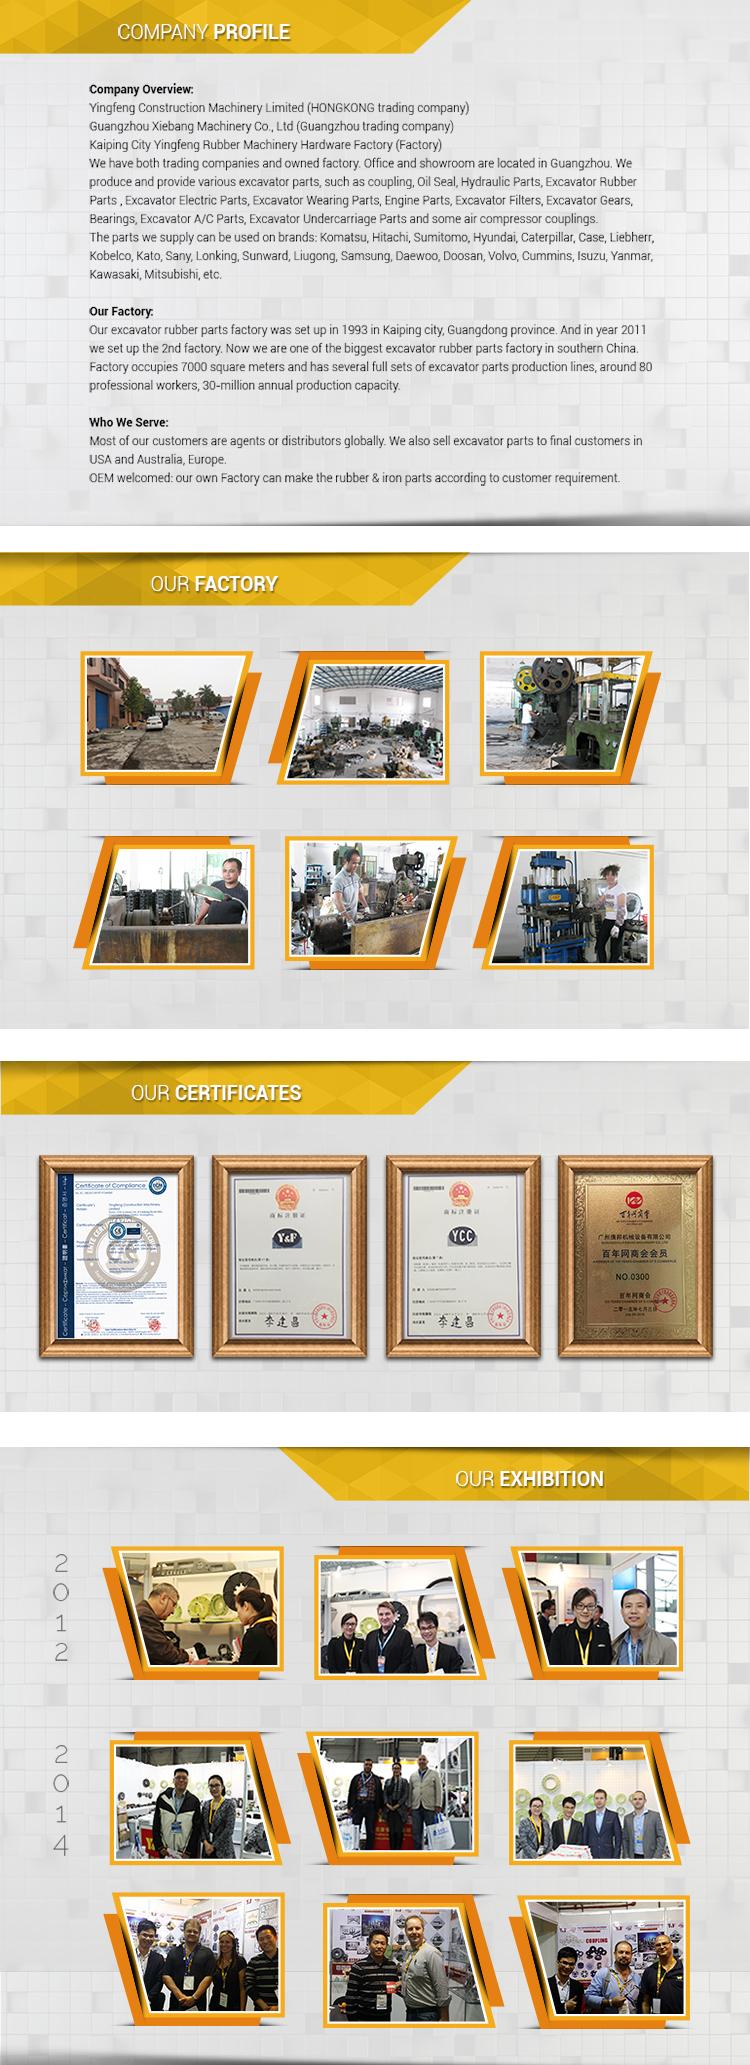 High-technology Machine Parts Construction Machinery Parts Excavator ...